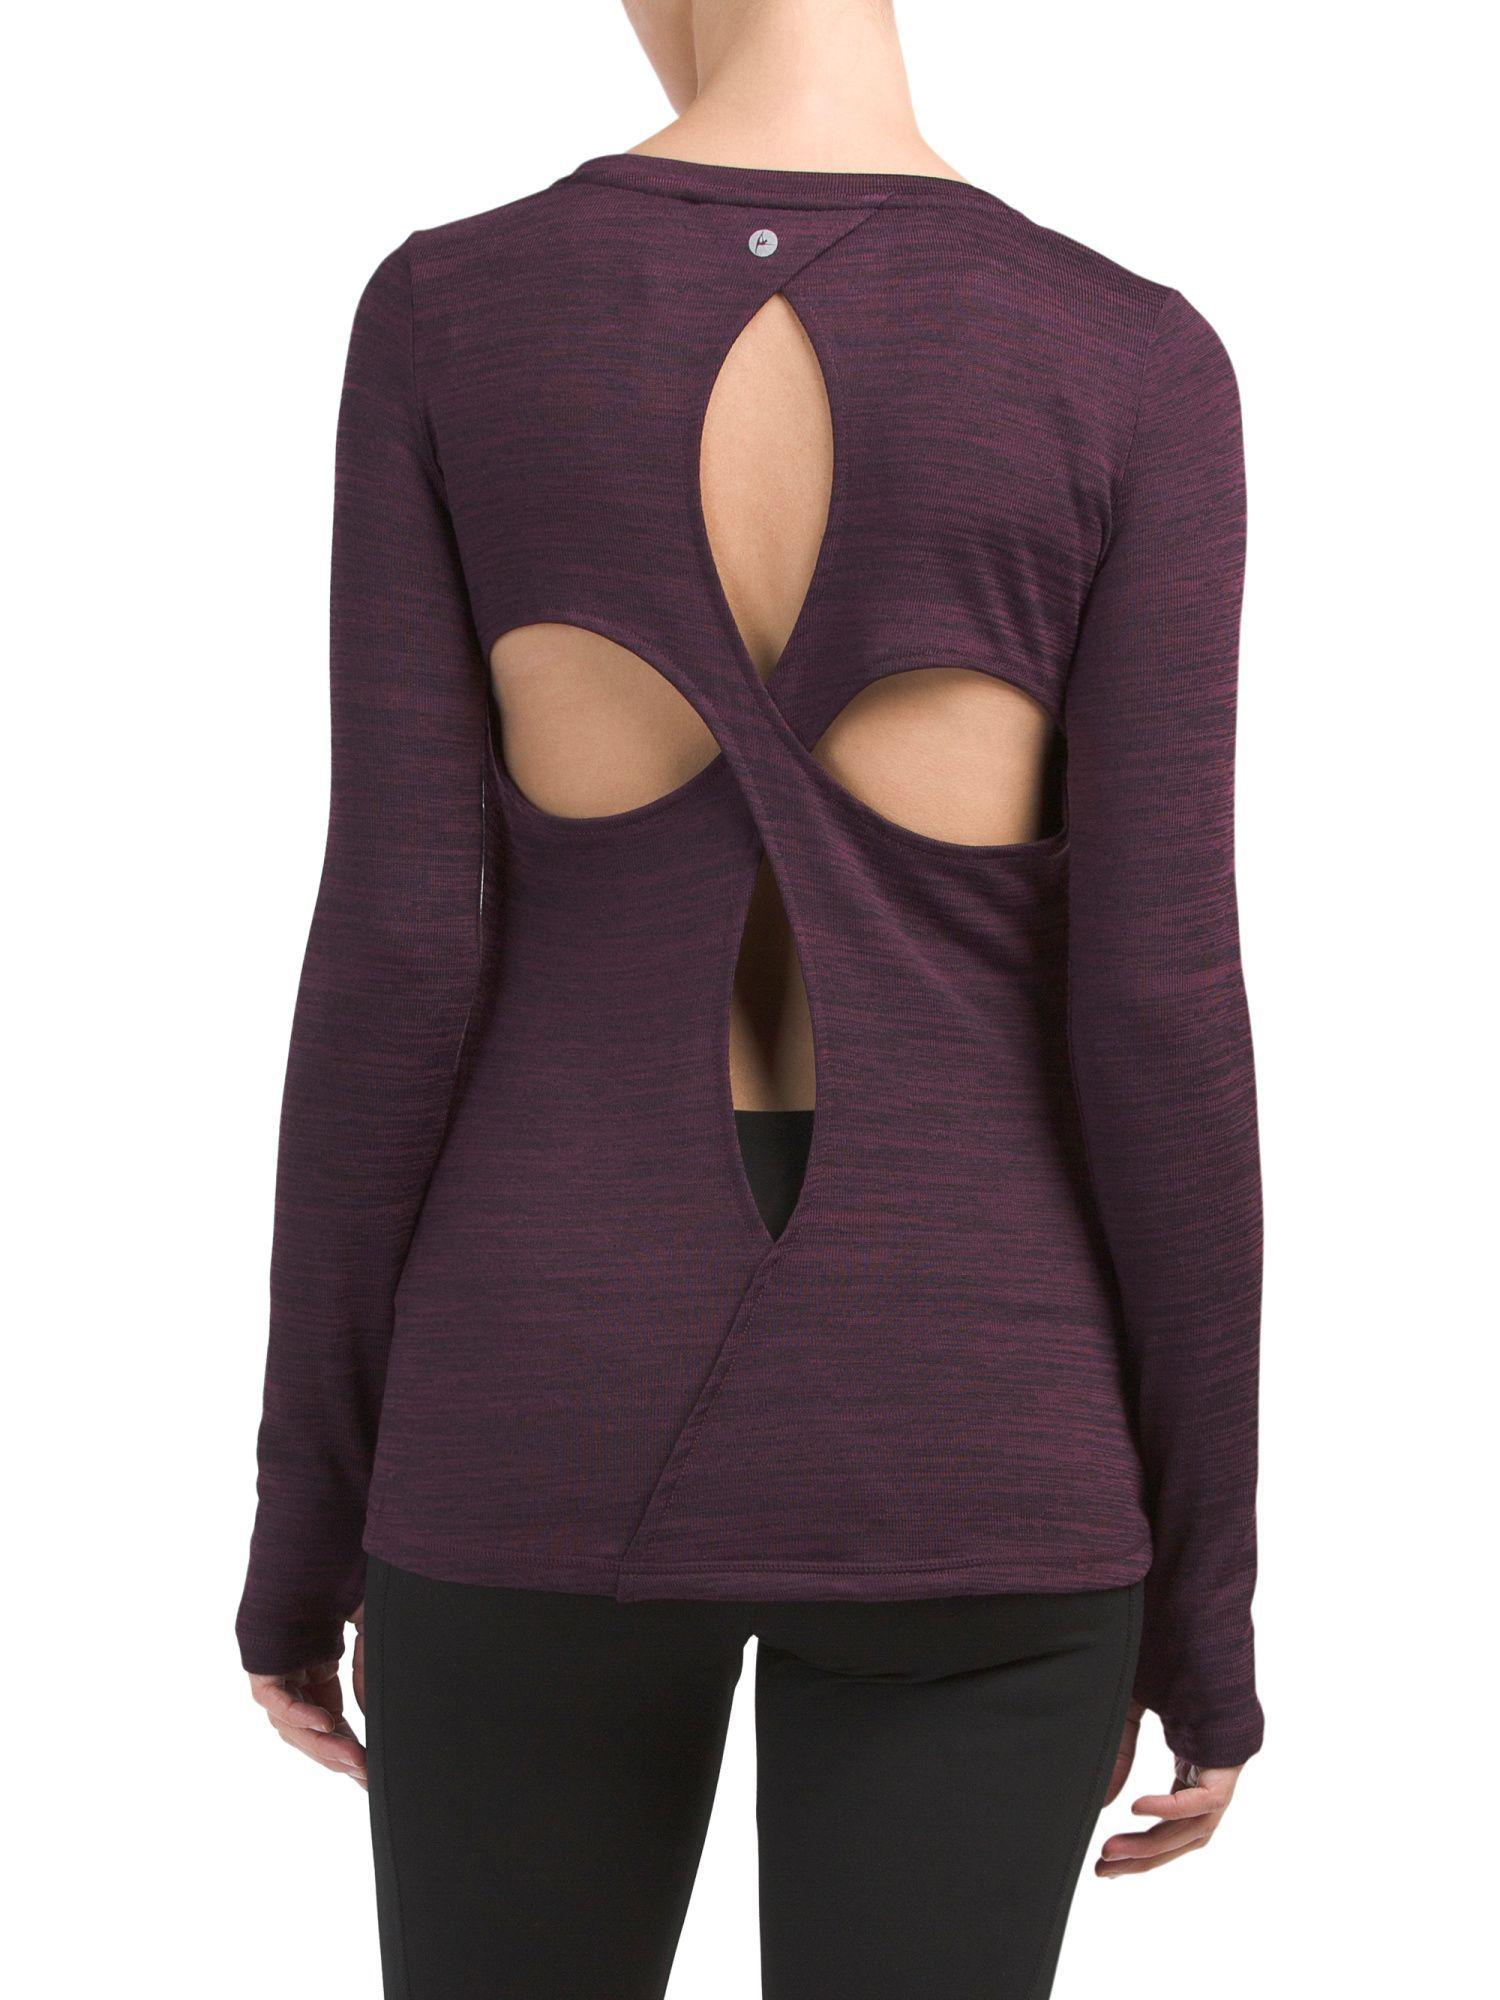 Clover Back Top Tops, Fashion, Fashion design